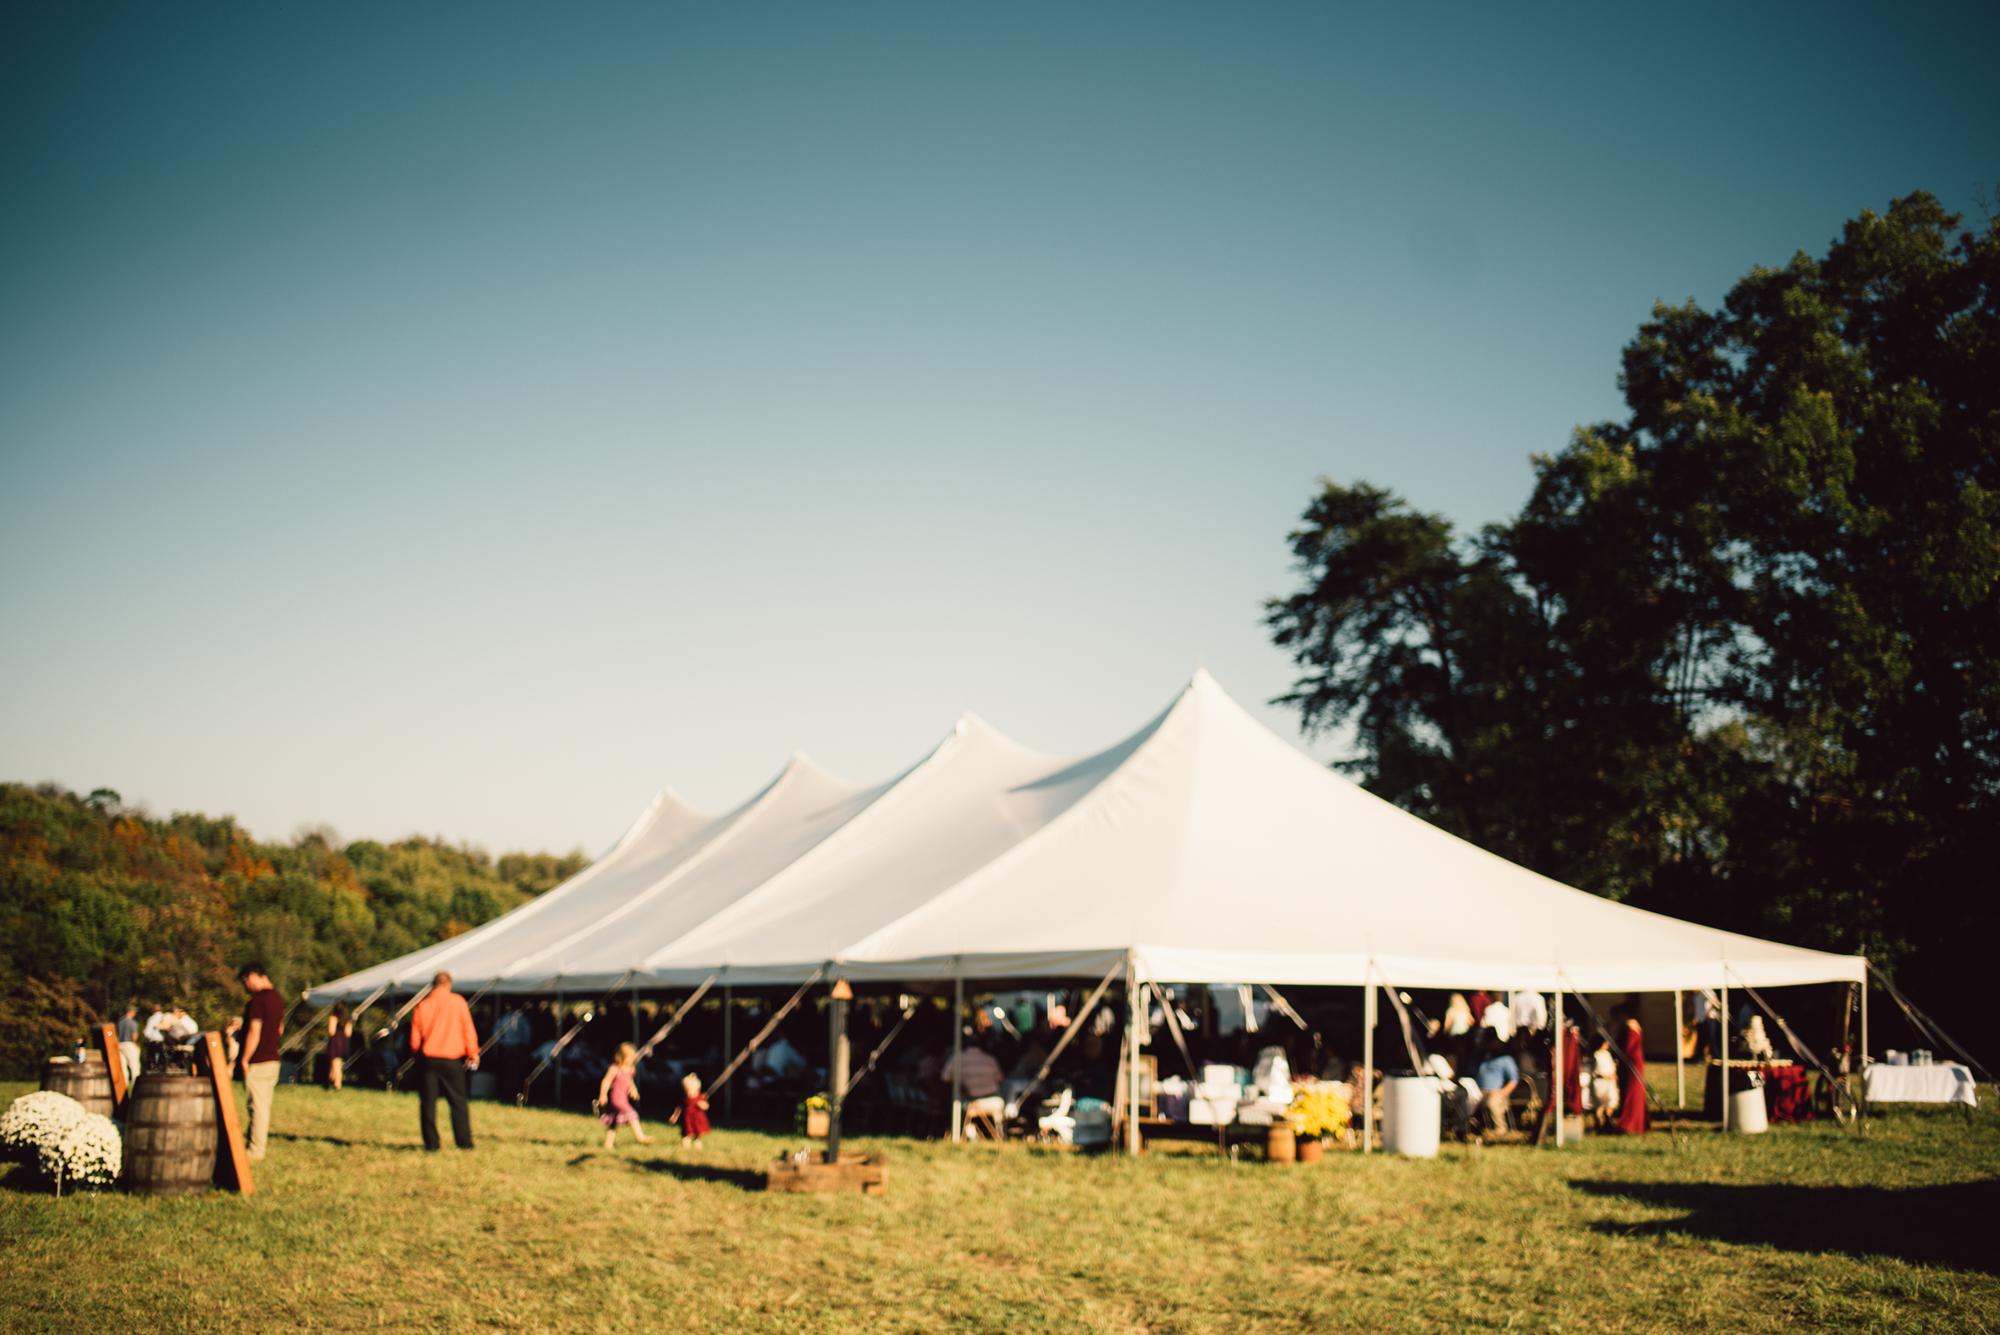 Ashley-and-Michael-Beaune-Woodstock-Virginia-Wedding-Shenandoah-Valley_32.JPG